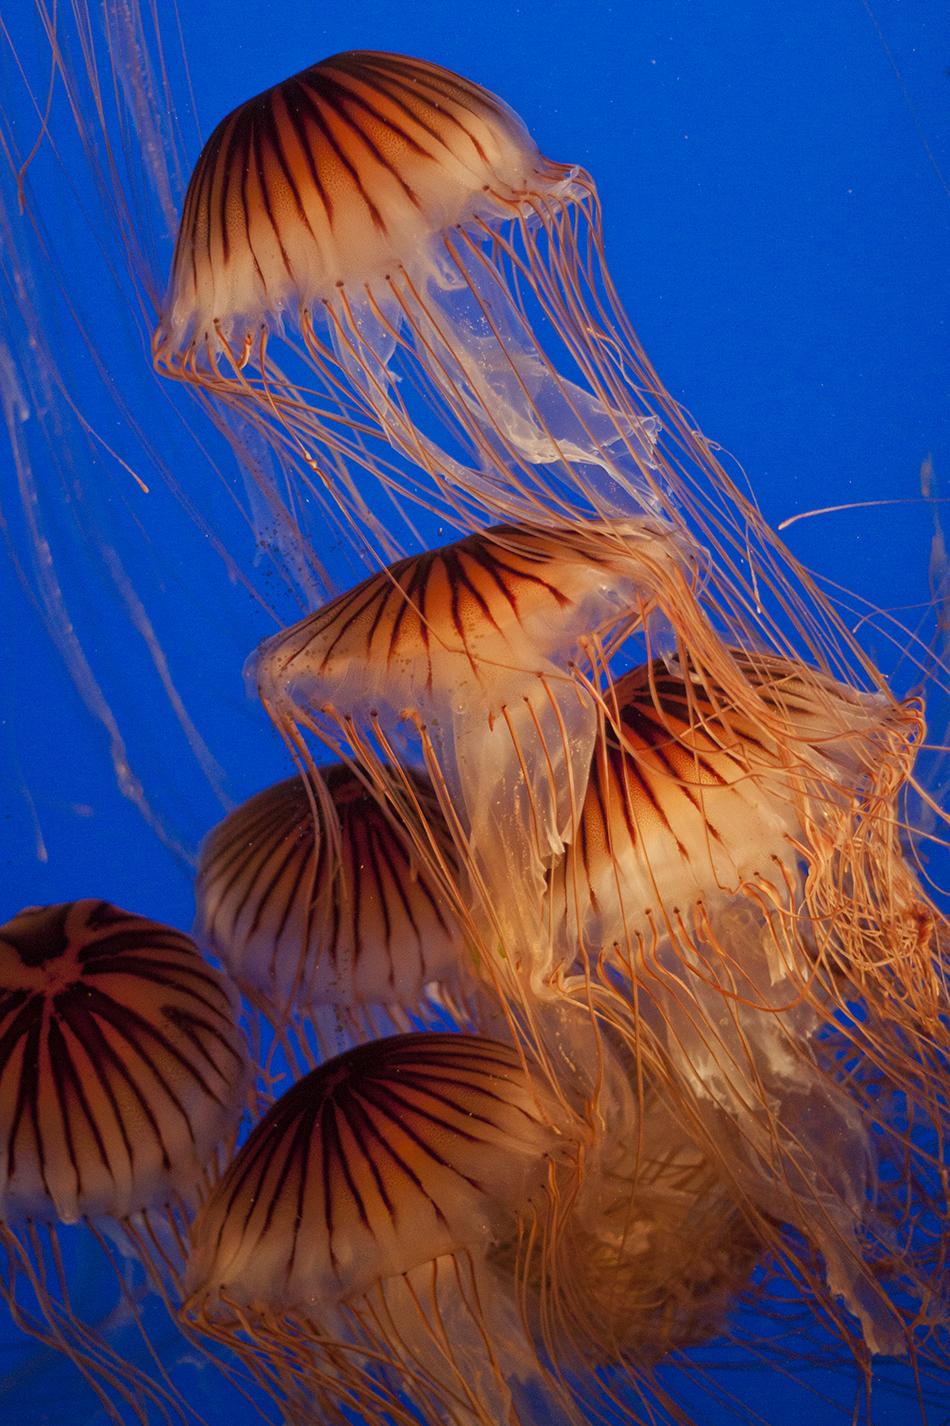 Jellyfish at the Vancouver Aquarium.